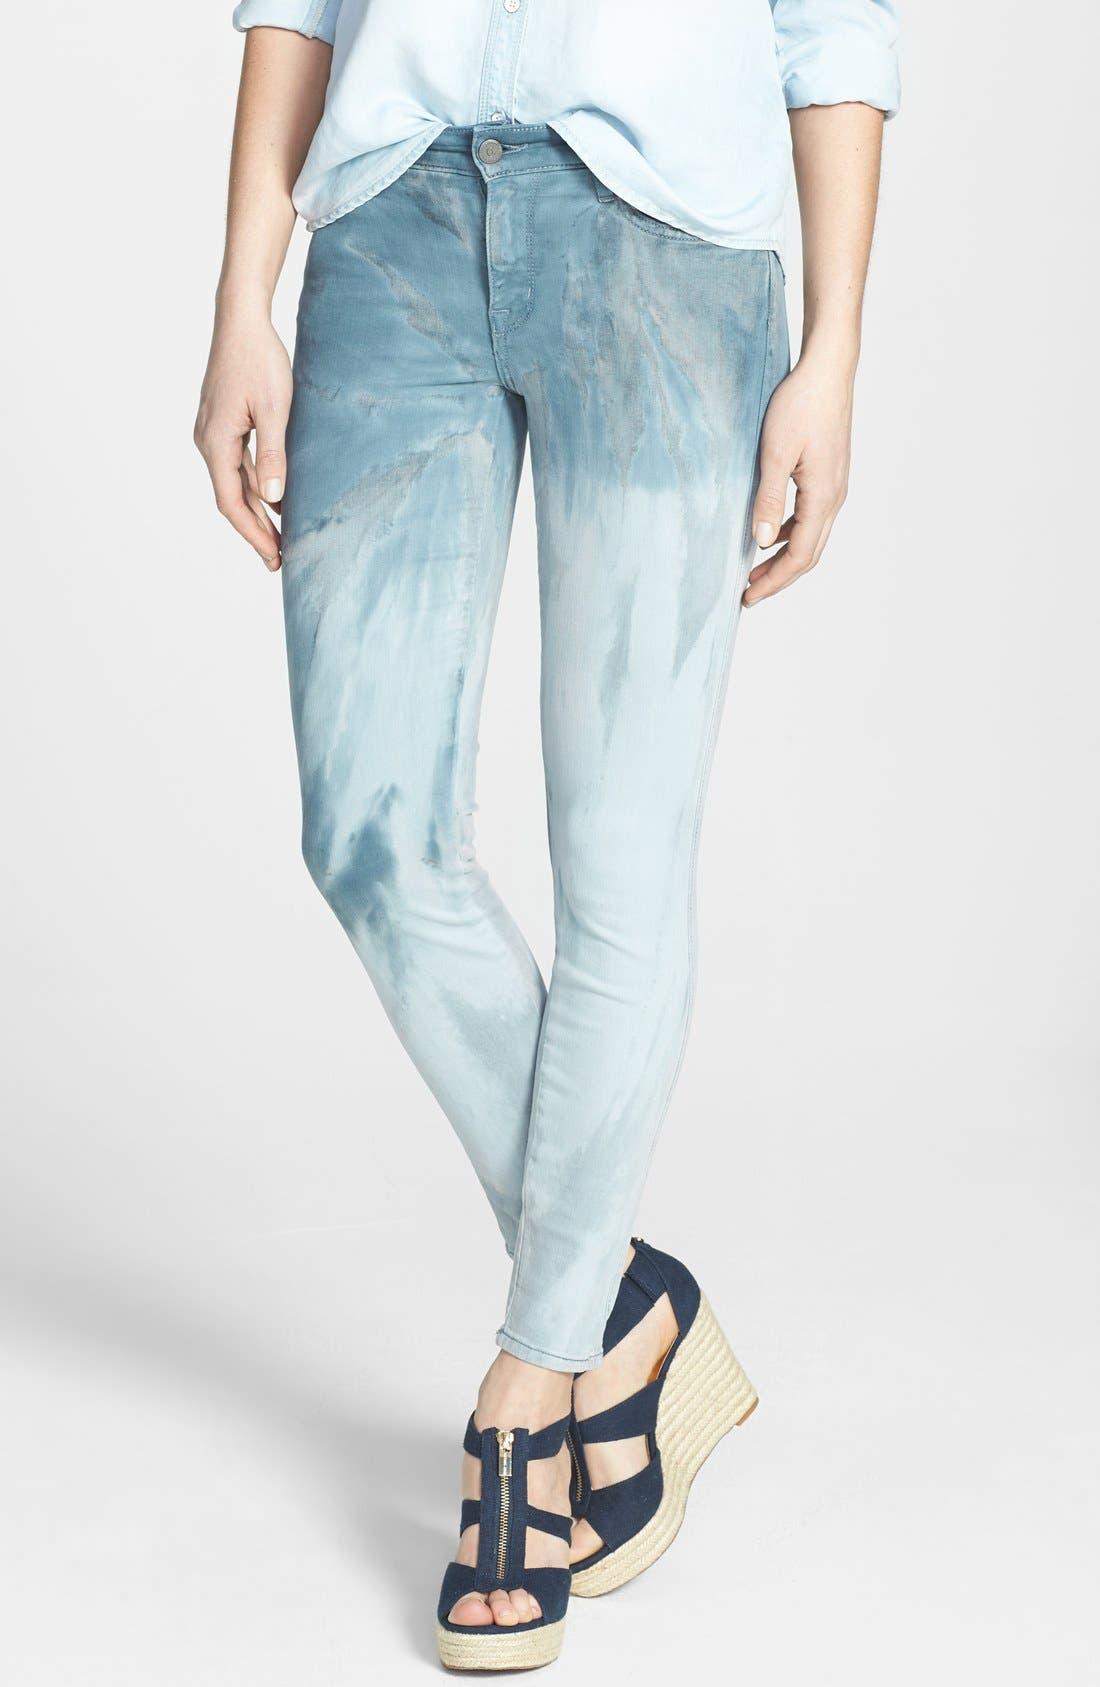 Alternate Image 1 Selected - CJ by Cookie Johnson 'Wisdom' Ombré Tie Dye Ankle Skinny Jeans (Ocean)